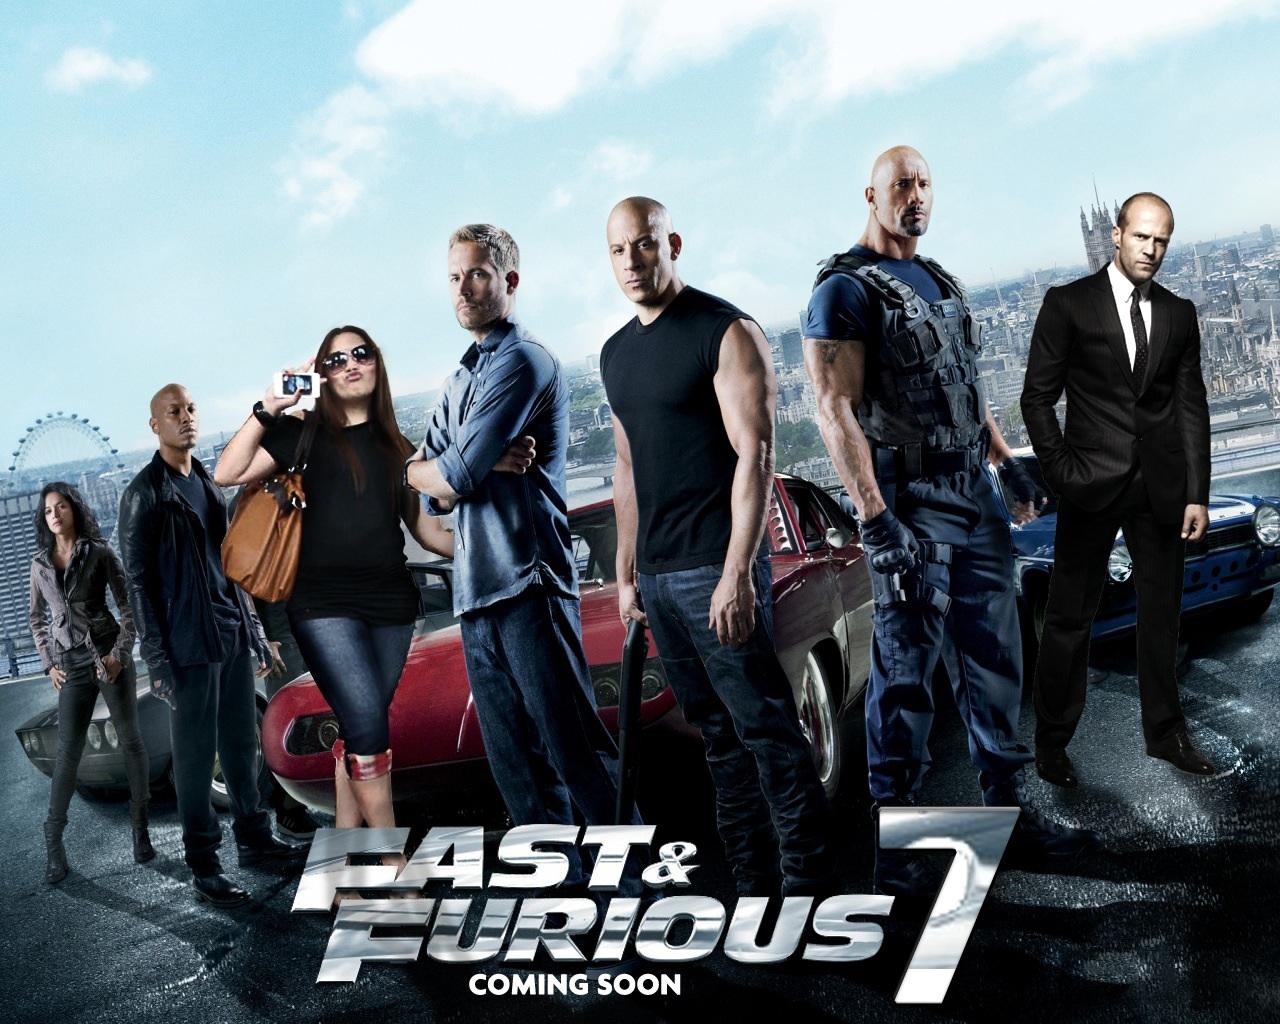 fast furious 7 fast and furious 7 fast and furious 1280x1024